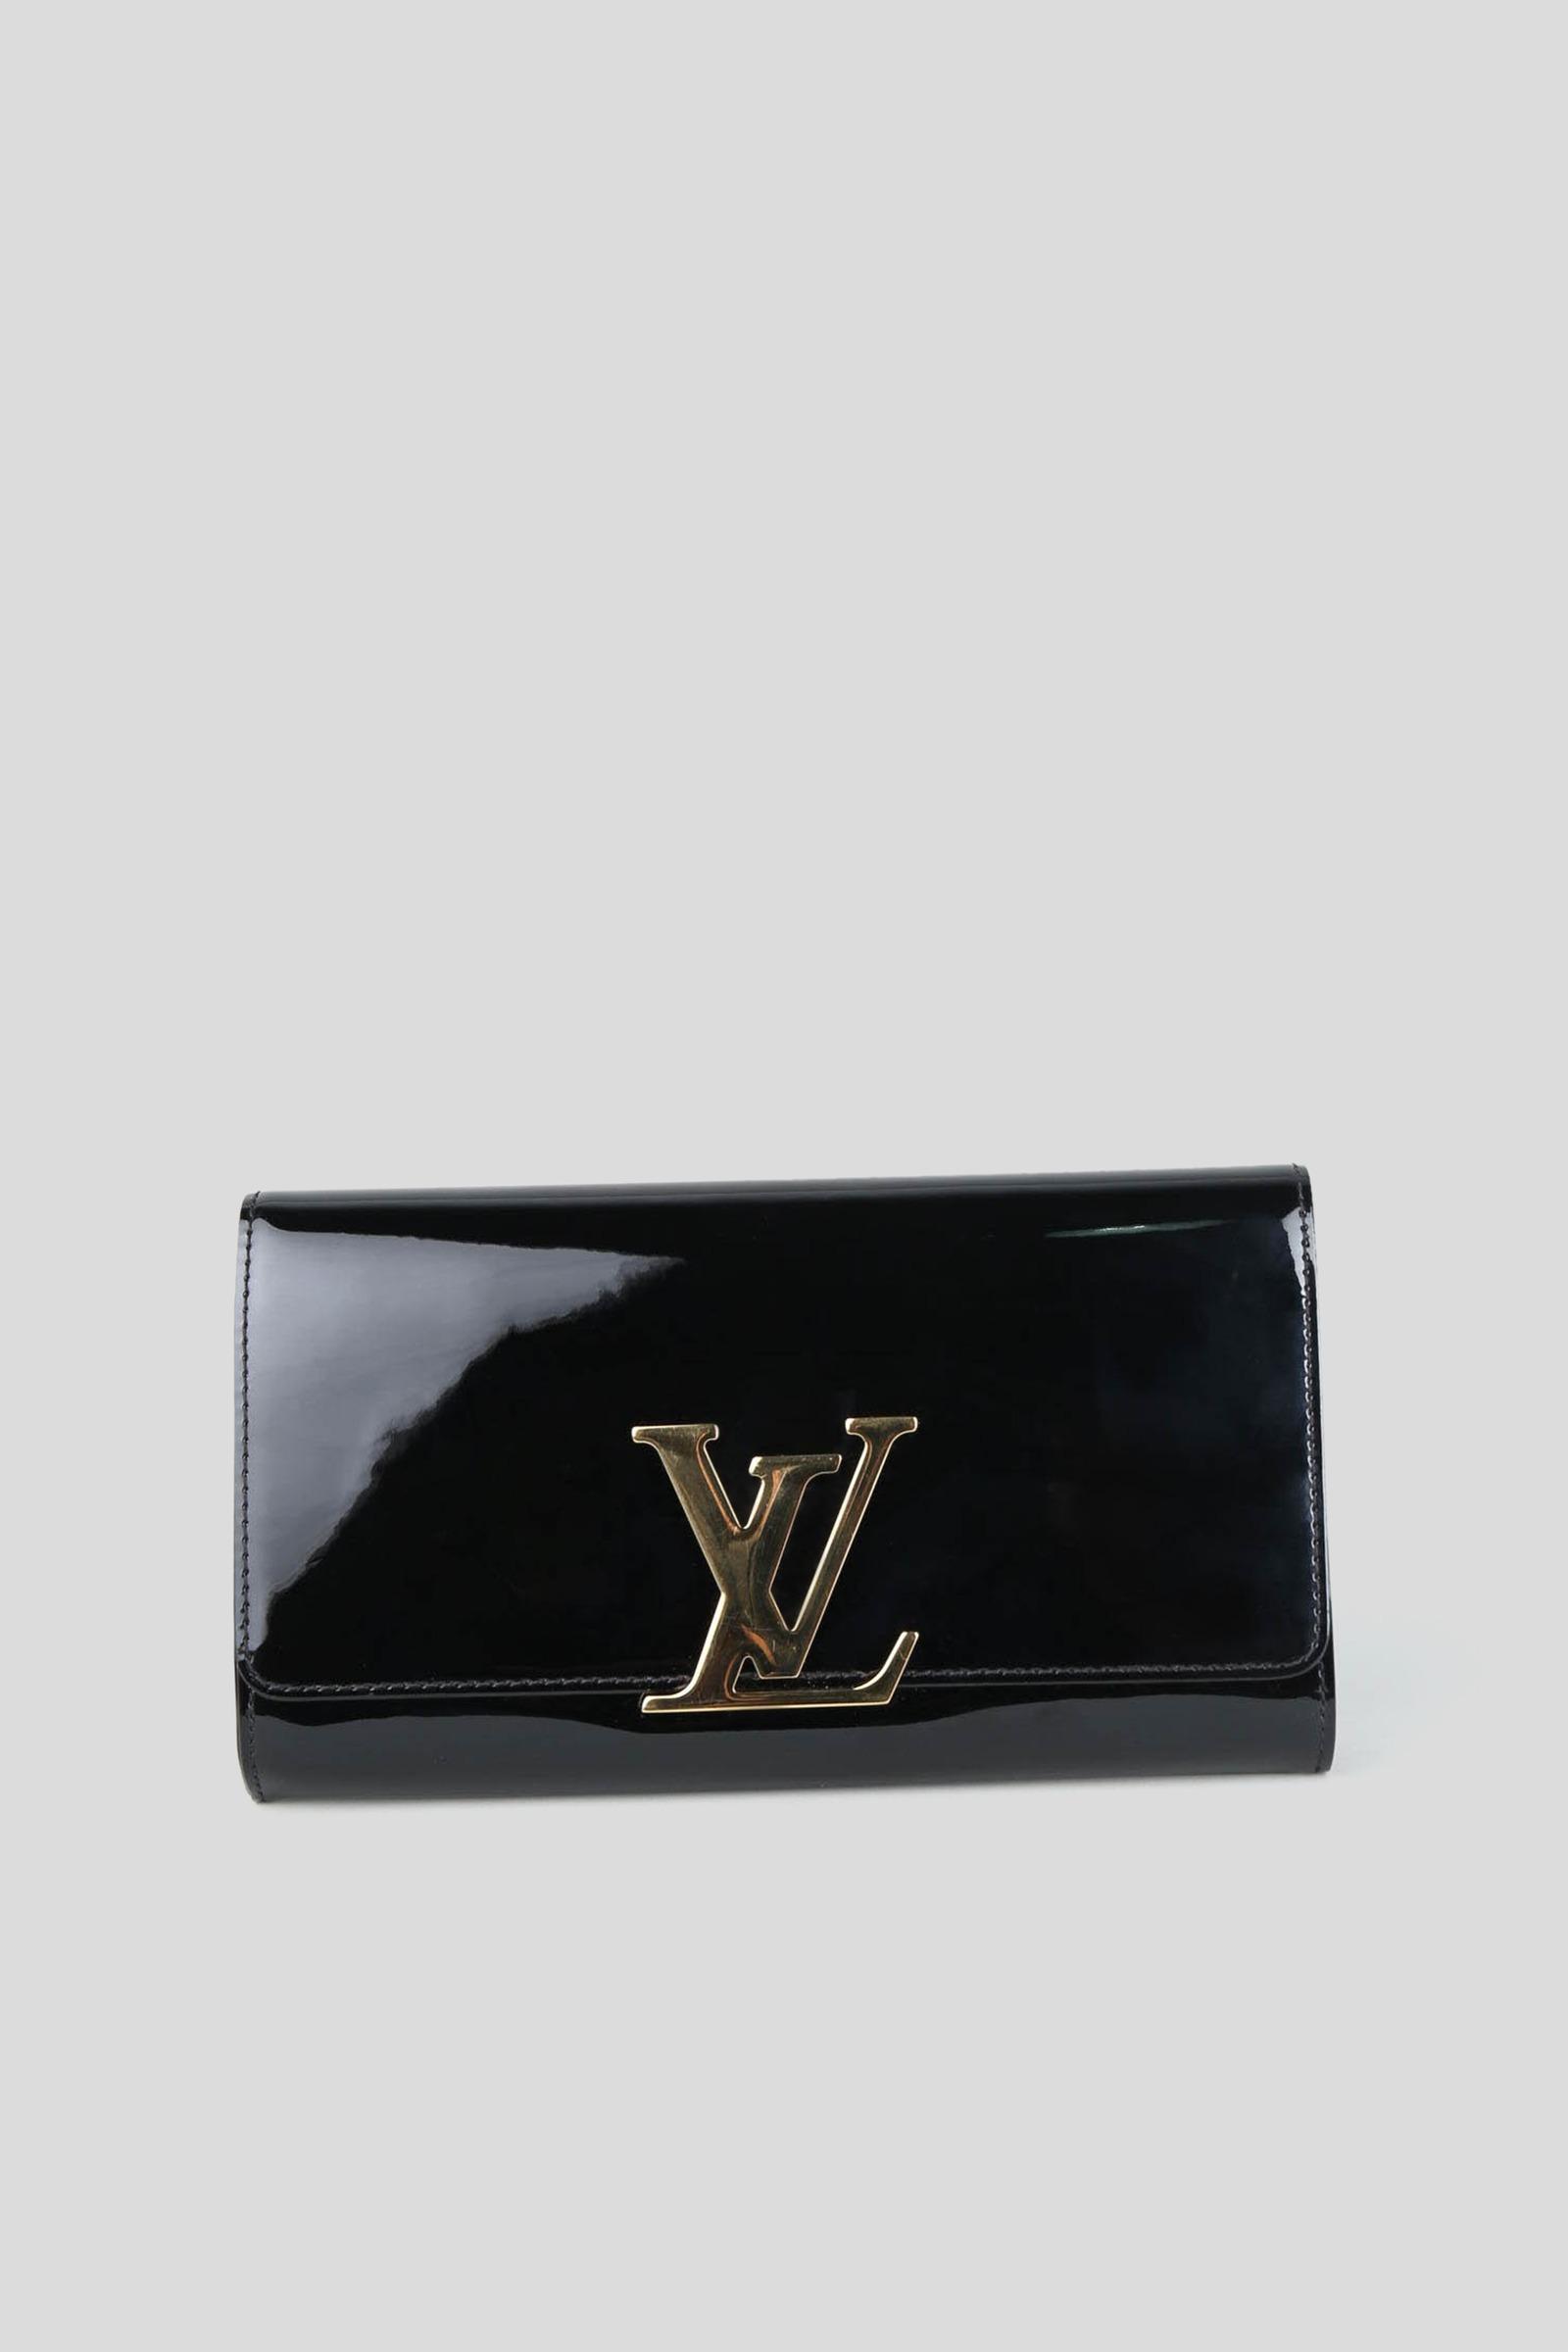 2eafc82b168e33 Rent LOUIS VUITTON Patent Leather Clutch in Dubai - Designer 24